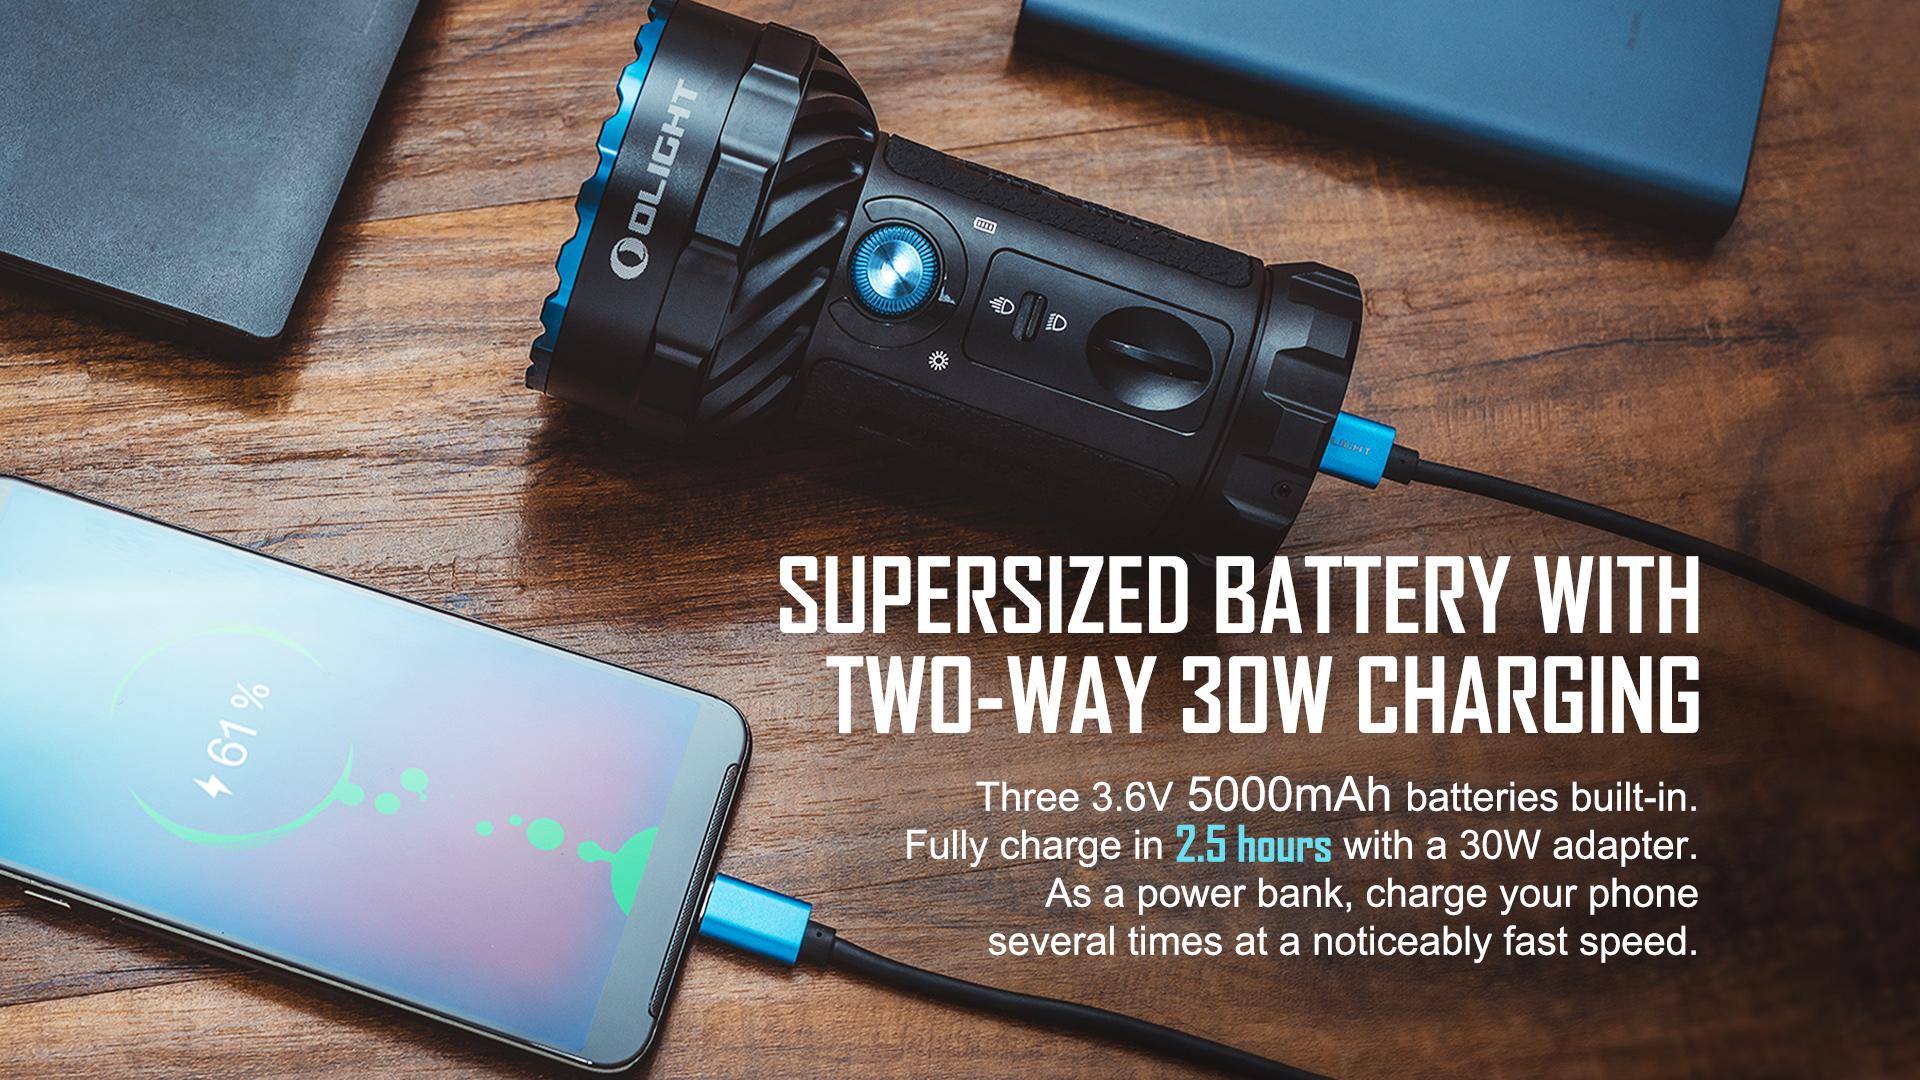 Olight Marauder 2 Most Powerful Flashlight Supersized Battery with 2 way Charging